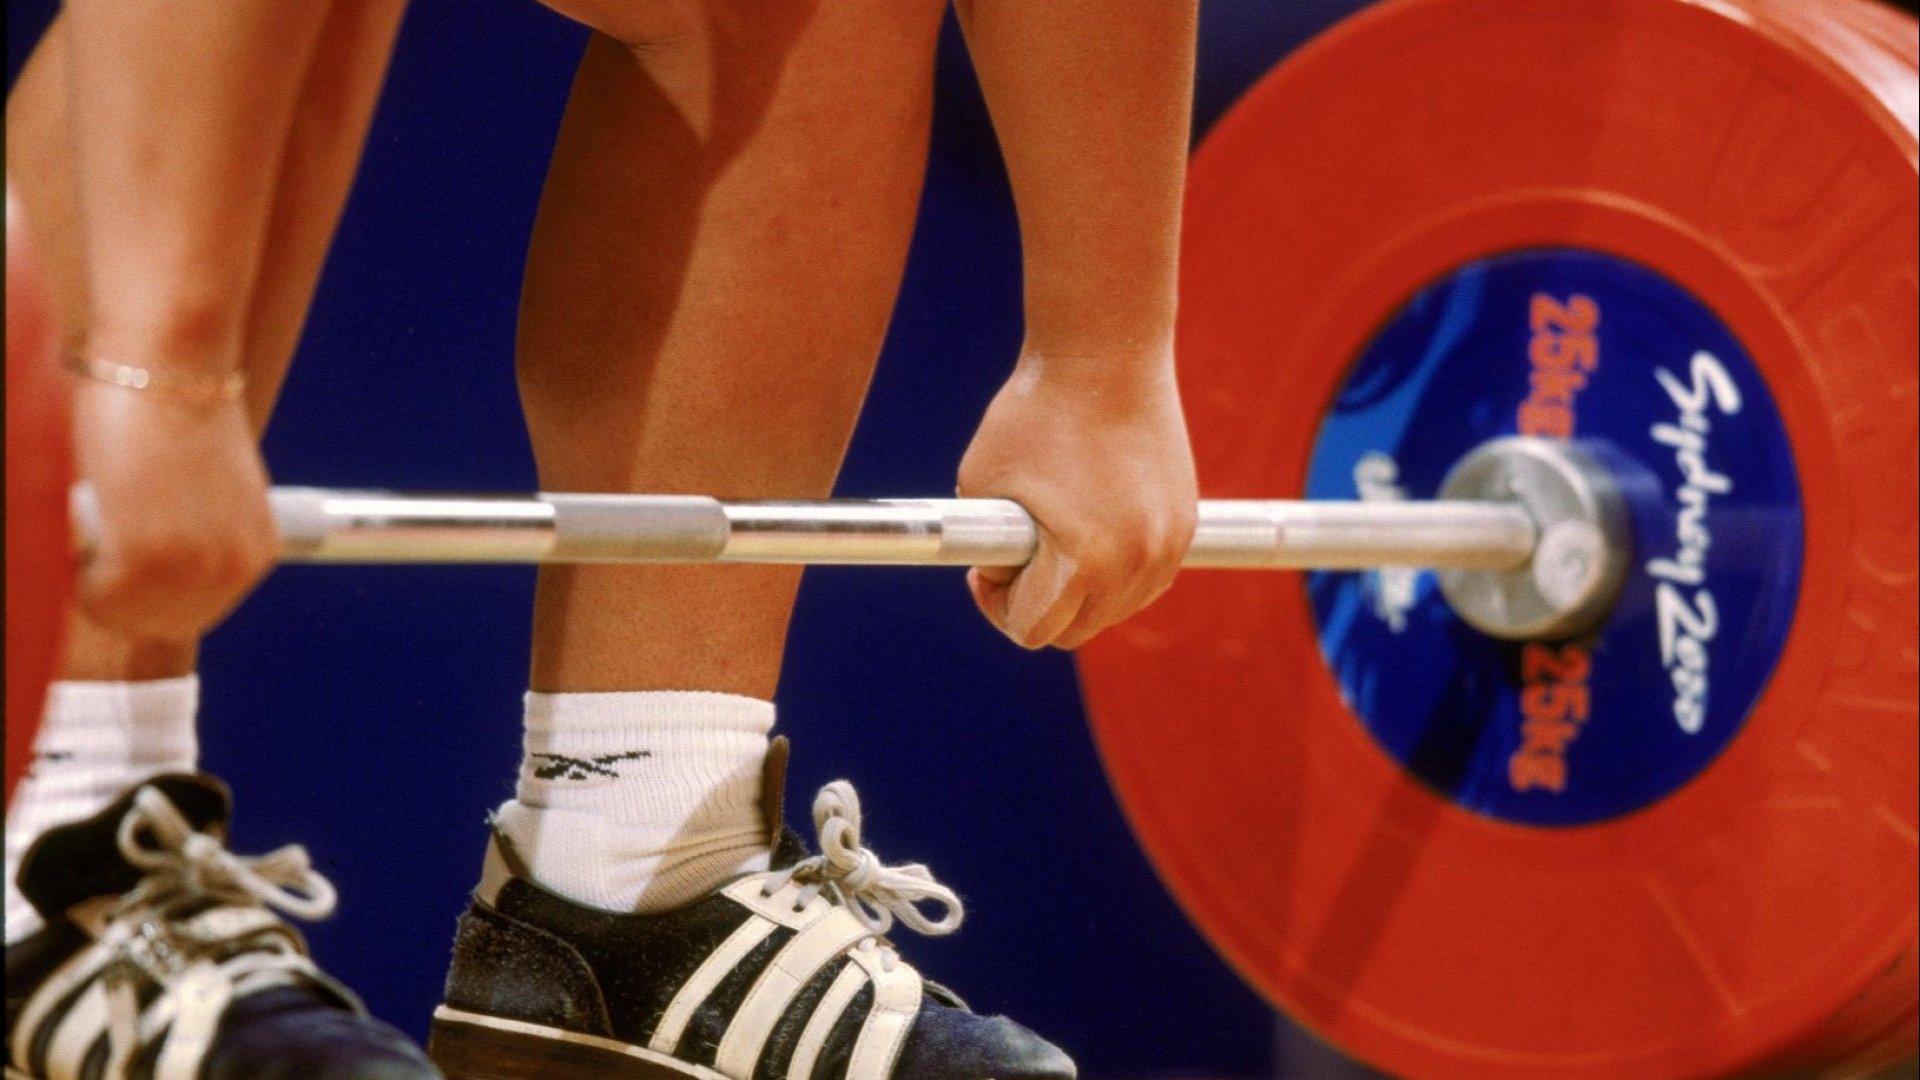 Руските щанги платили 5 милиона долара подкуп за протекции при допинг проверки